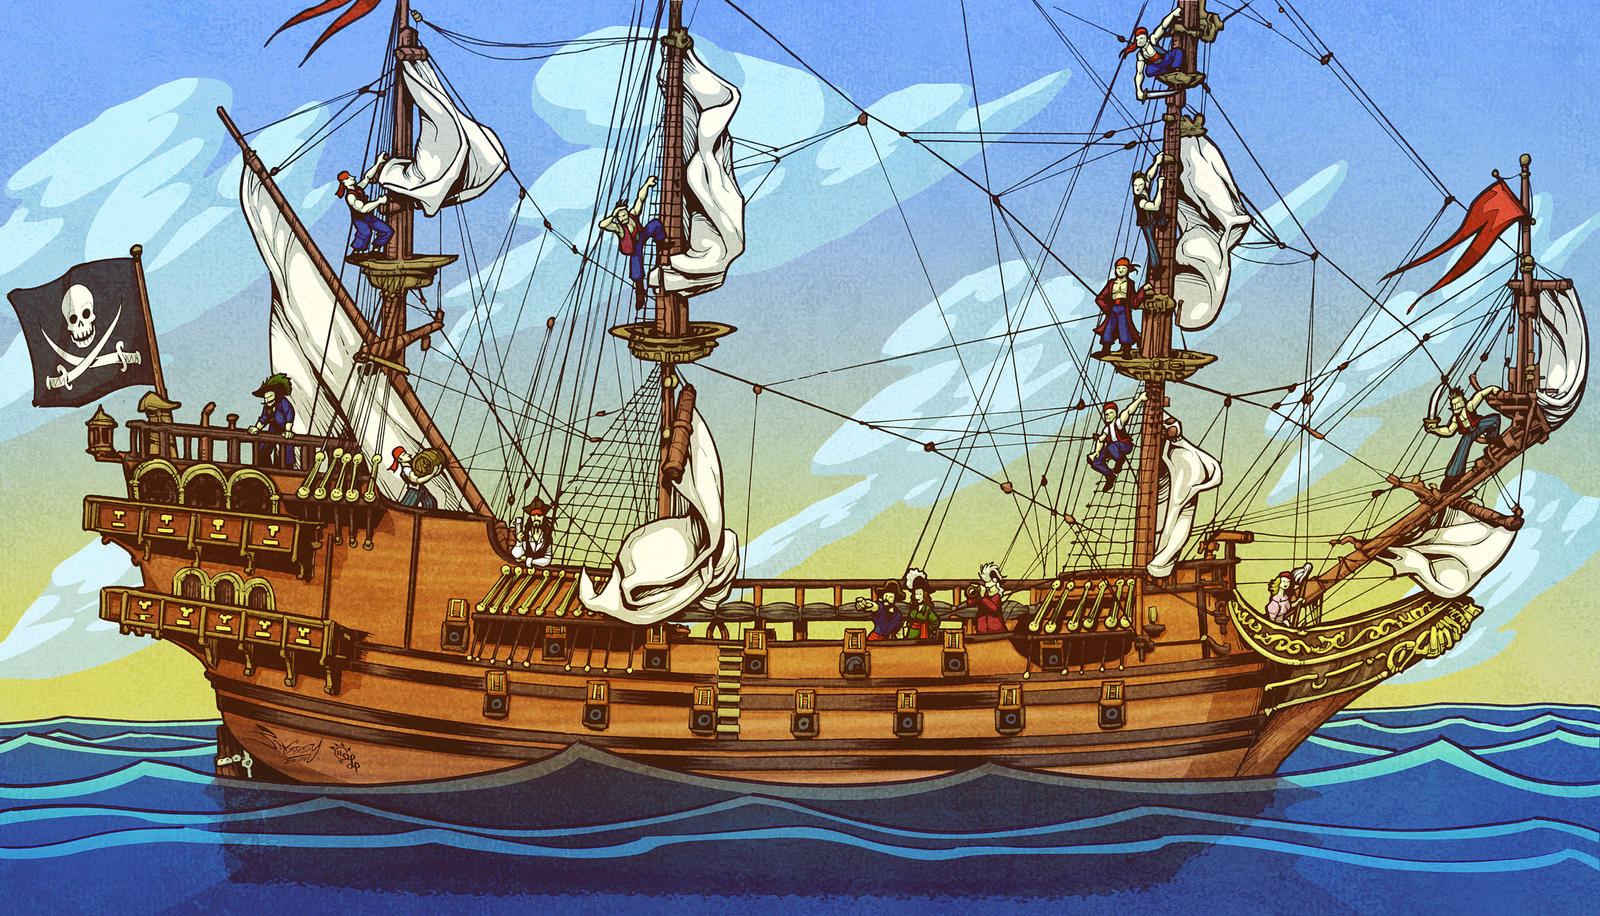 pirate ship by amarynceus on deviantart